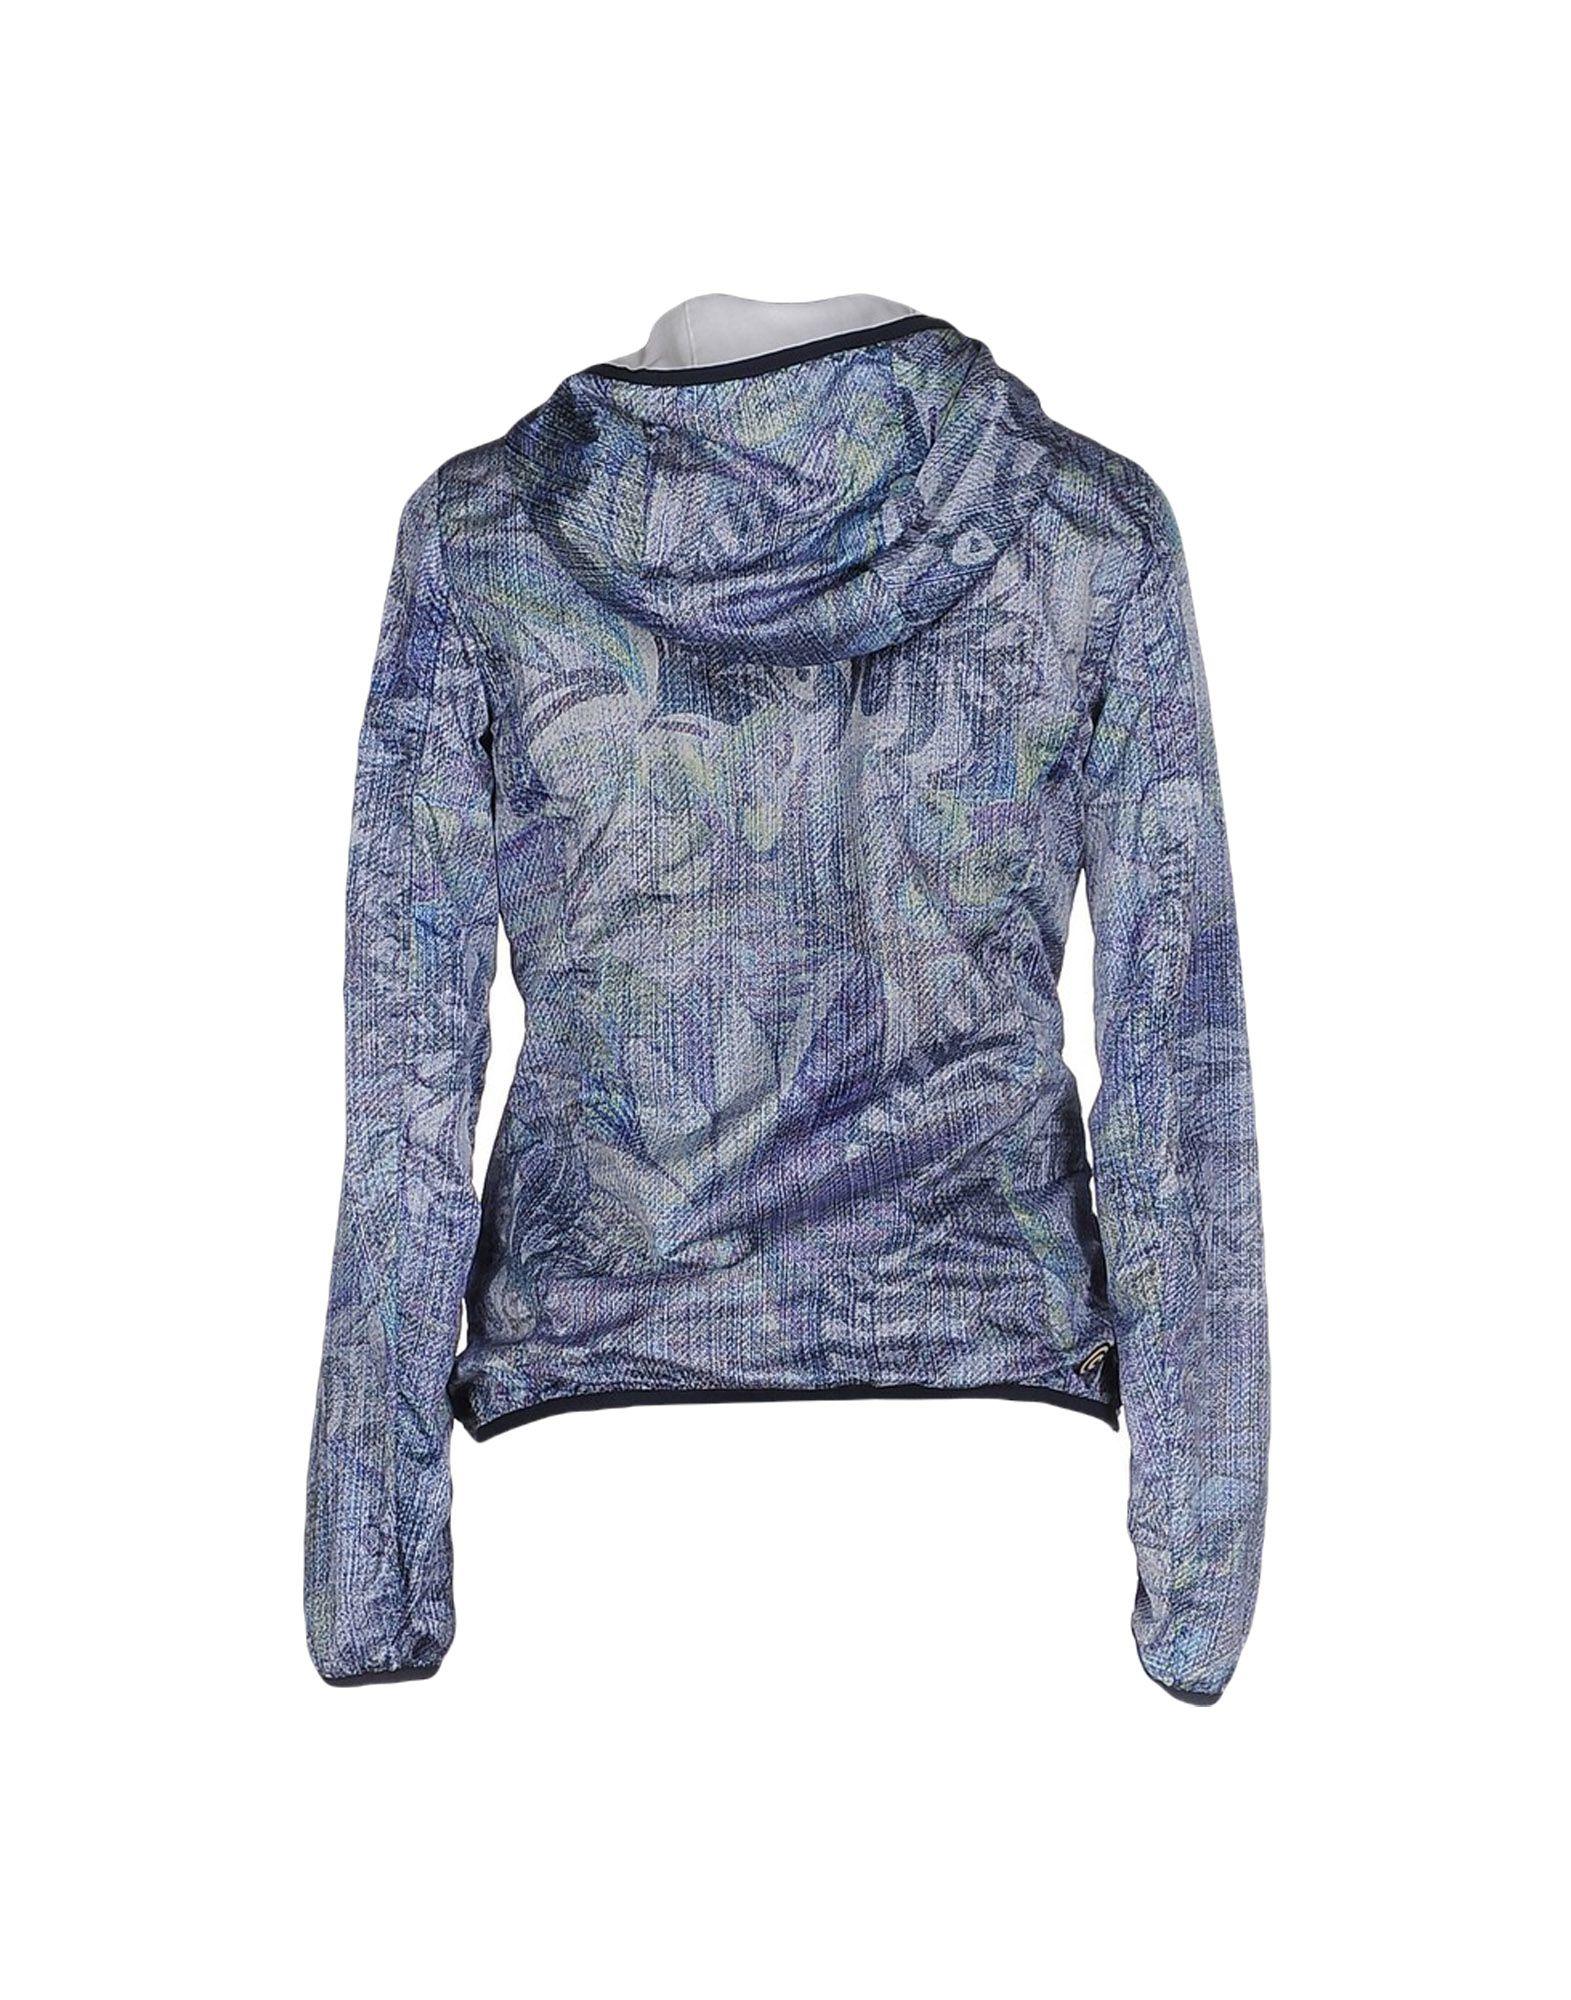 Lyst colmar jacket in blue for Blue piscine colmar